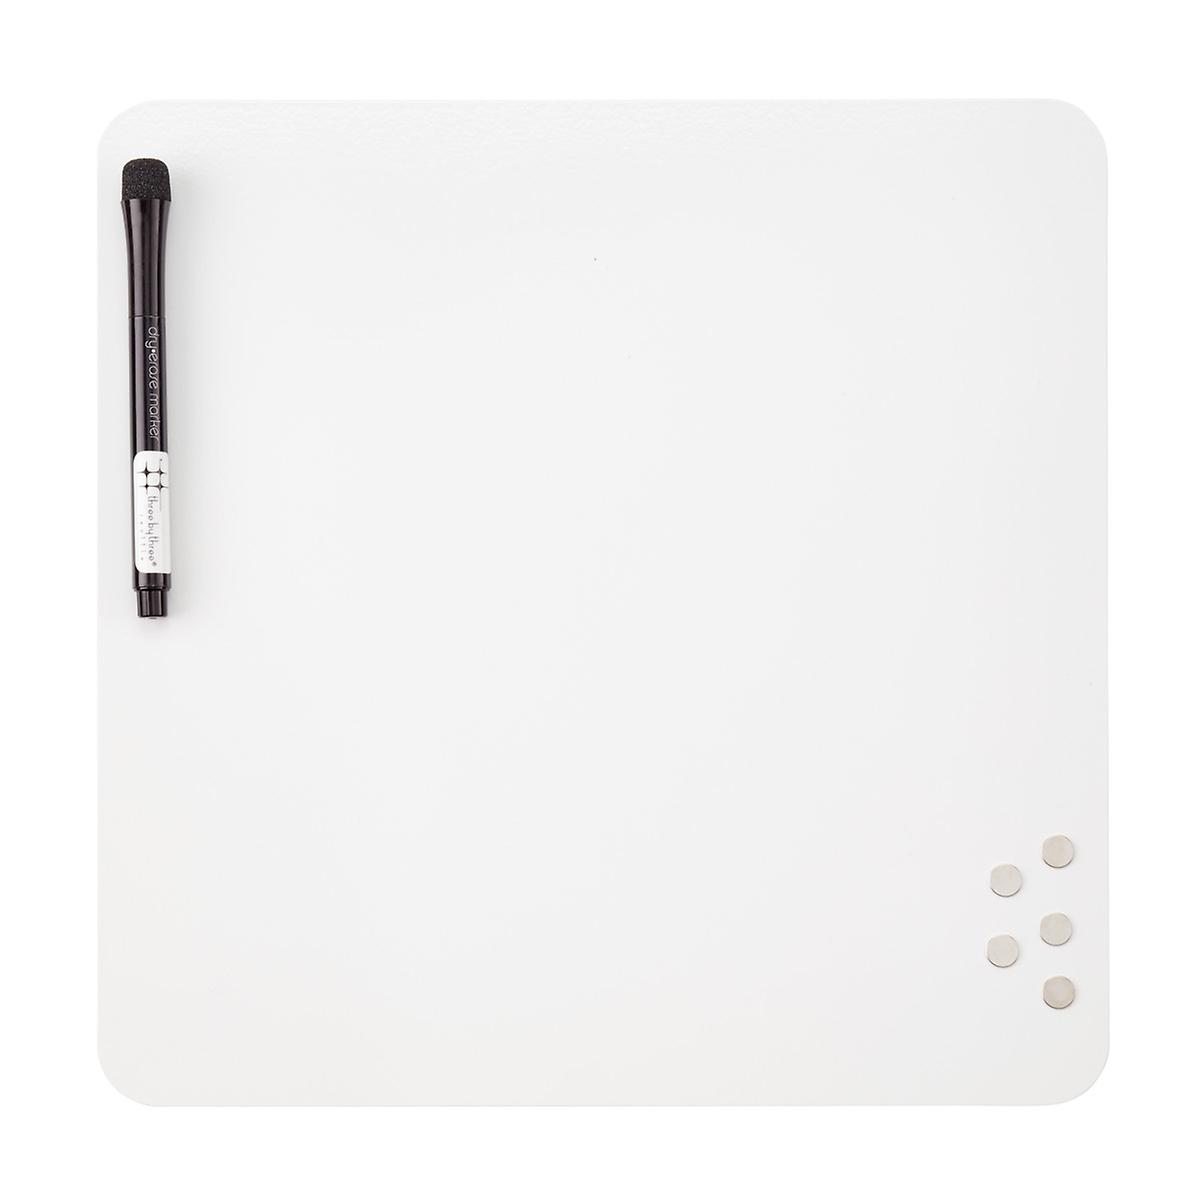 f26f7e78b59 Three by Three Square Magnetic Dry Erase Board